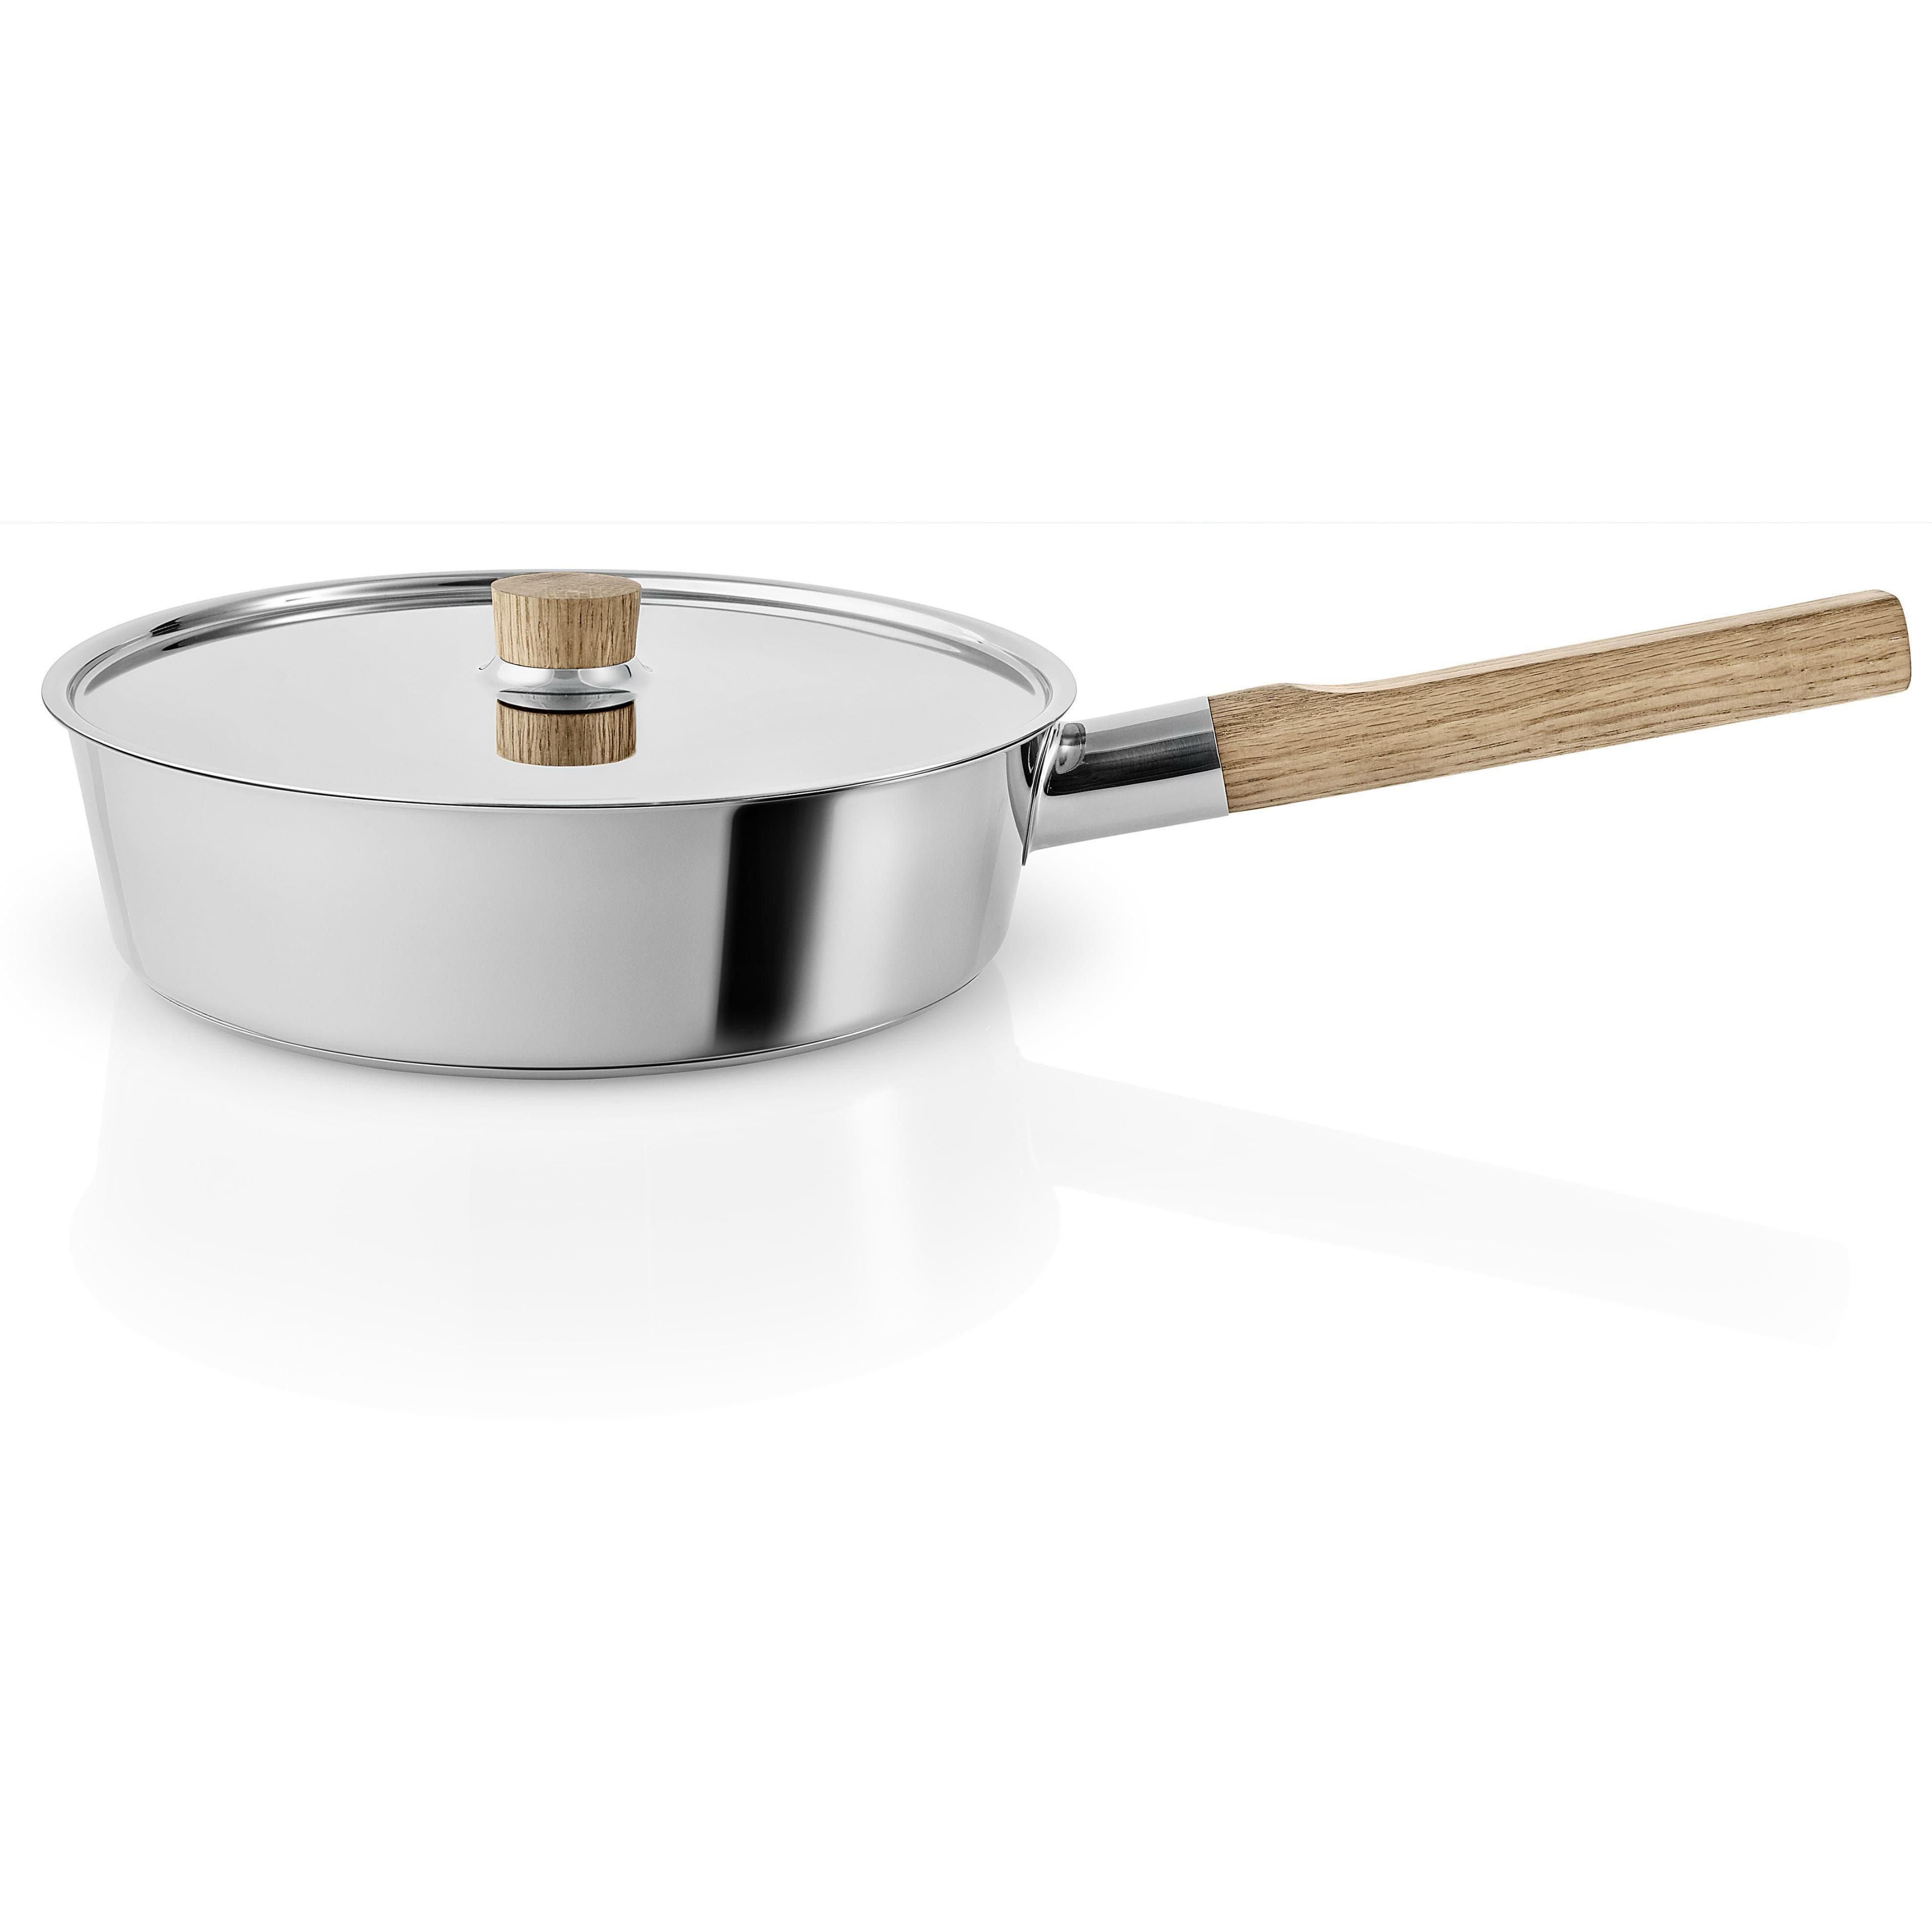 Eva Solo Nordic Kitchen Stainless-Steel Saute Pan